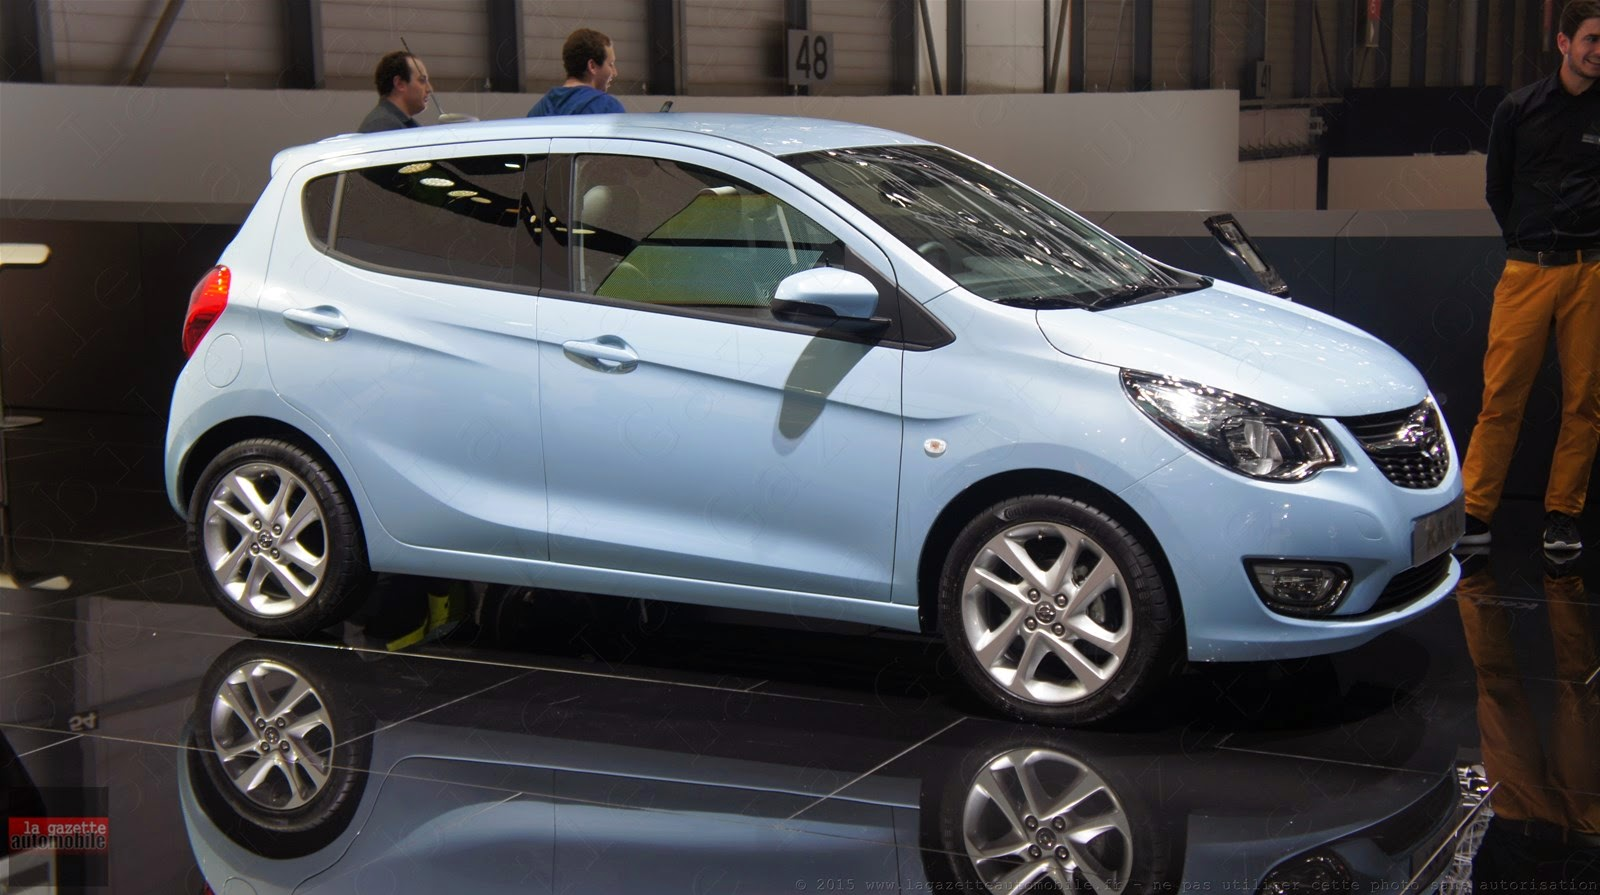 Genève 2015 Opel Karl